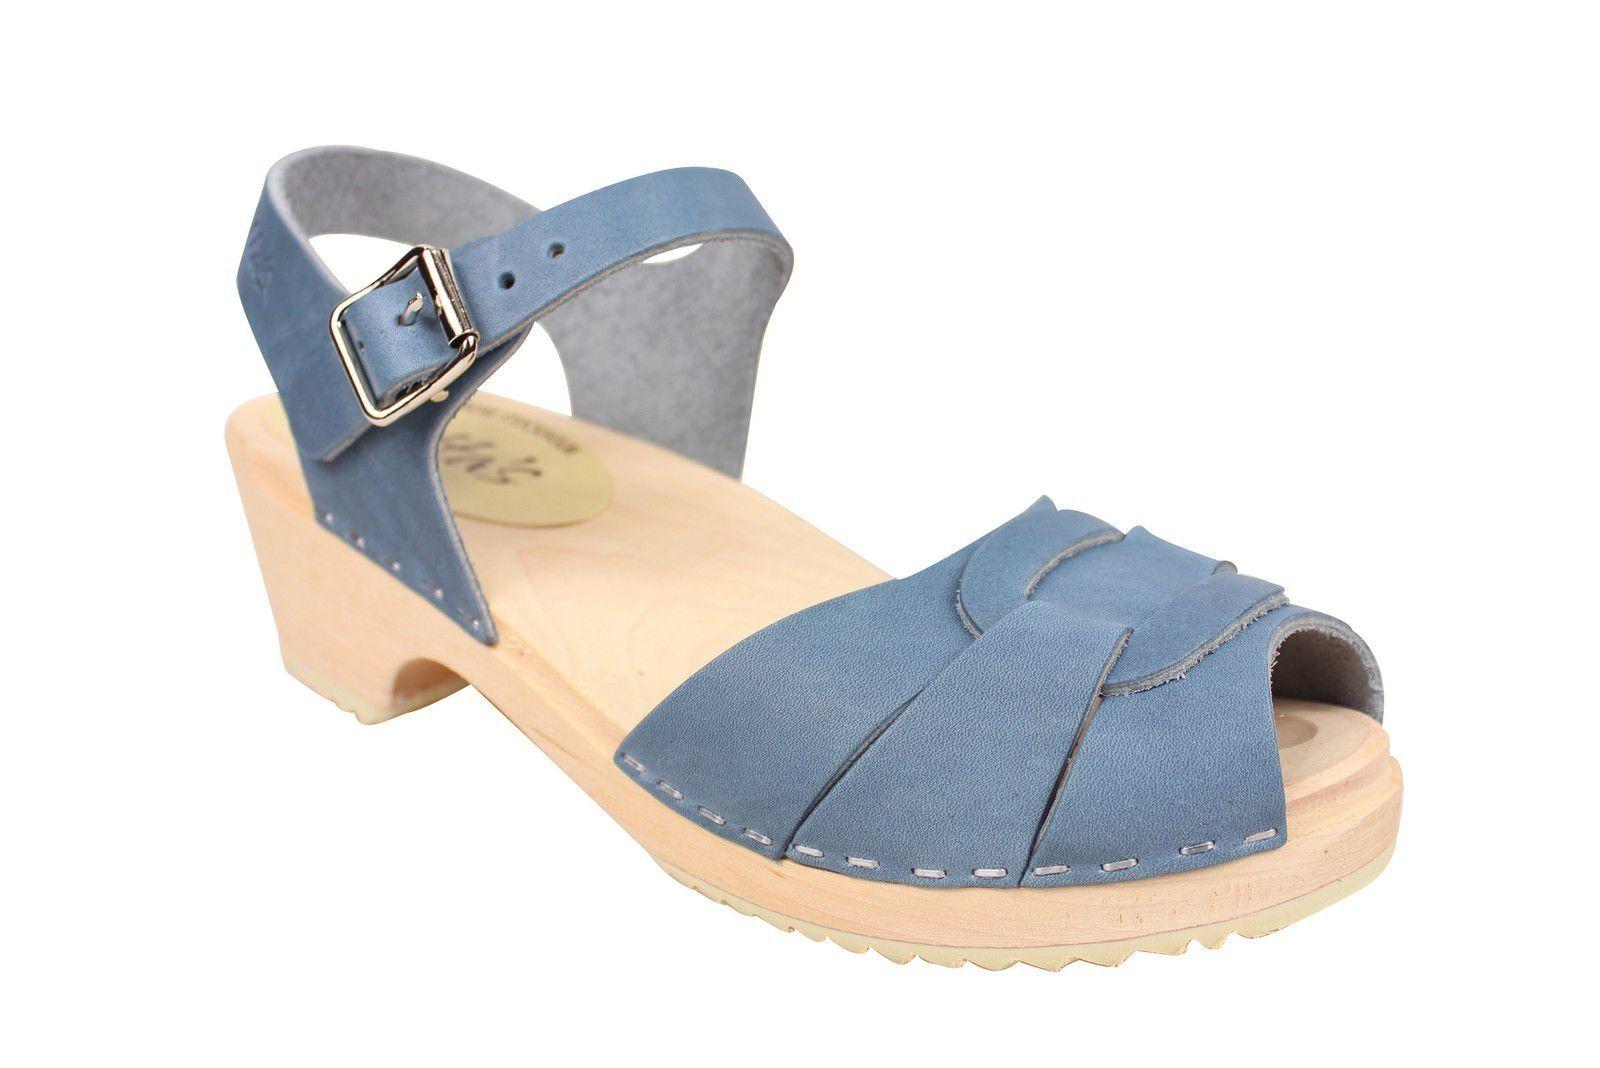 Lotta From Stockholm Low Heel Peep Toe in Steel Blue Leather Main